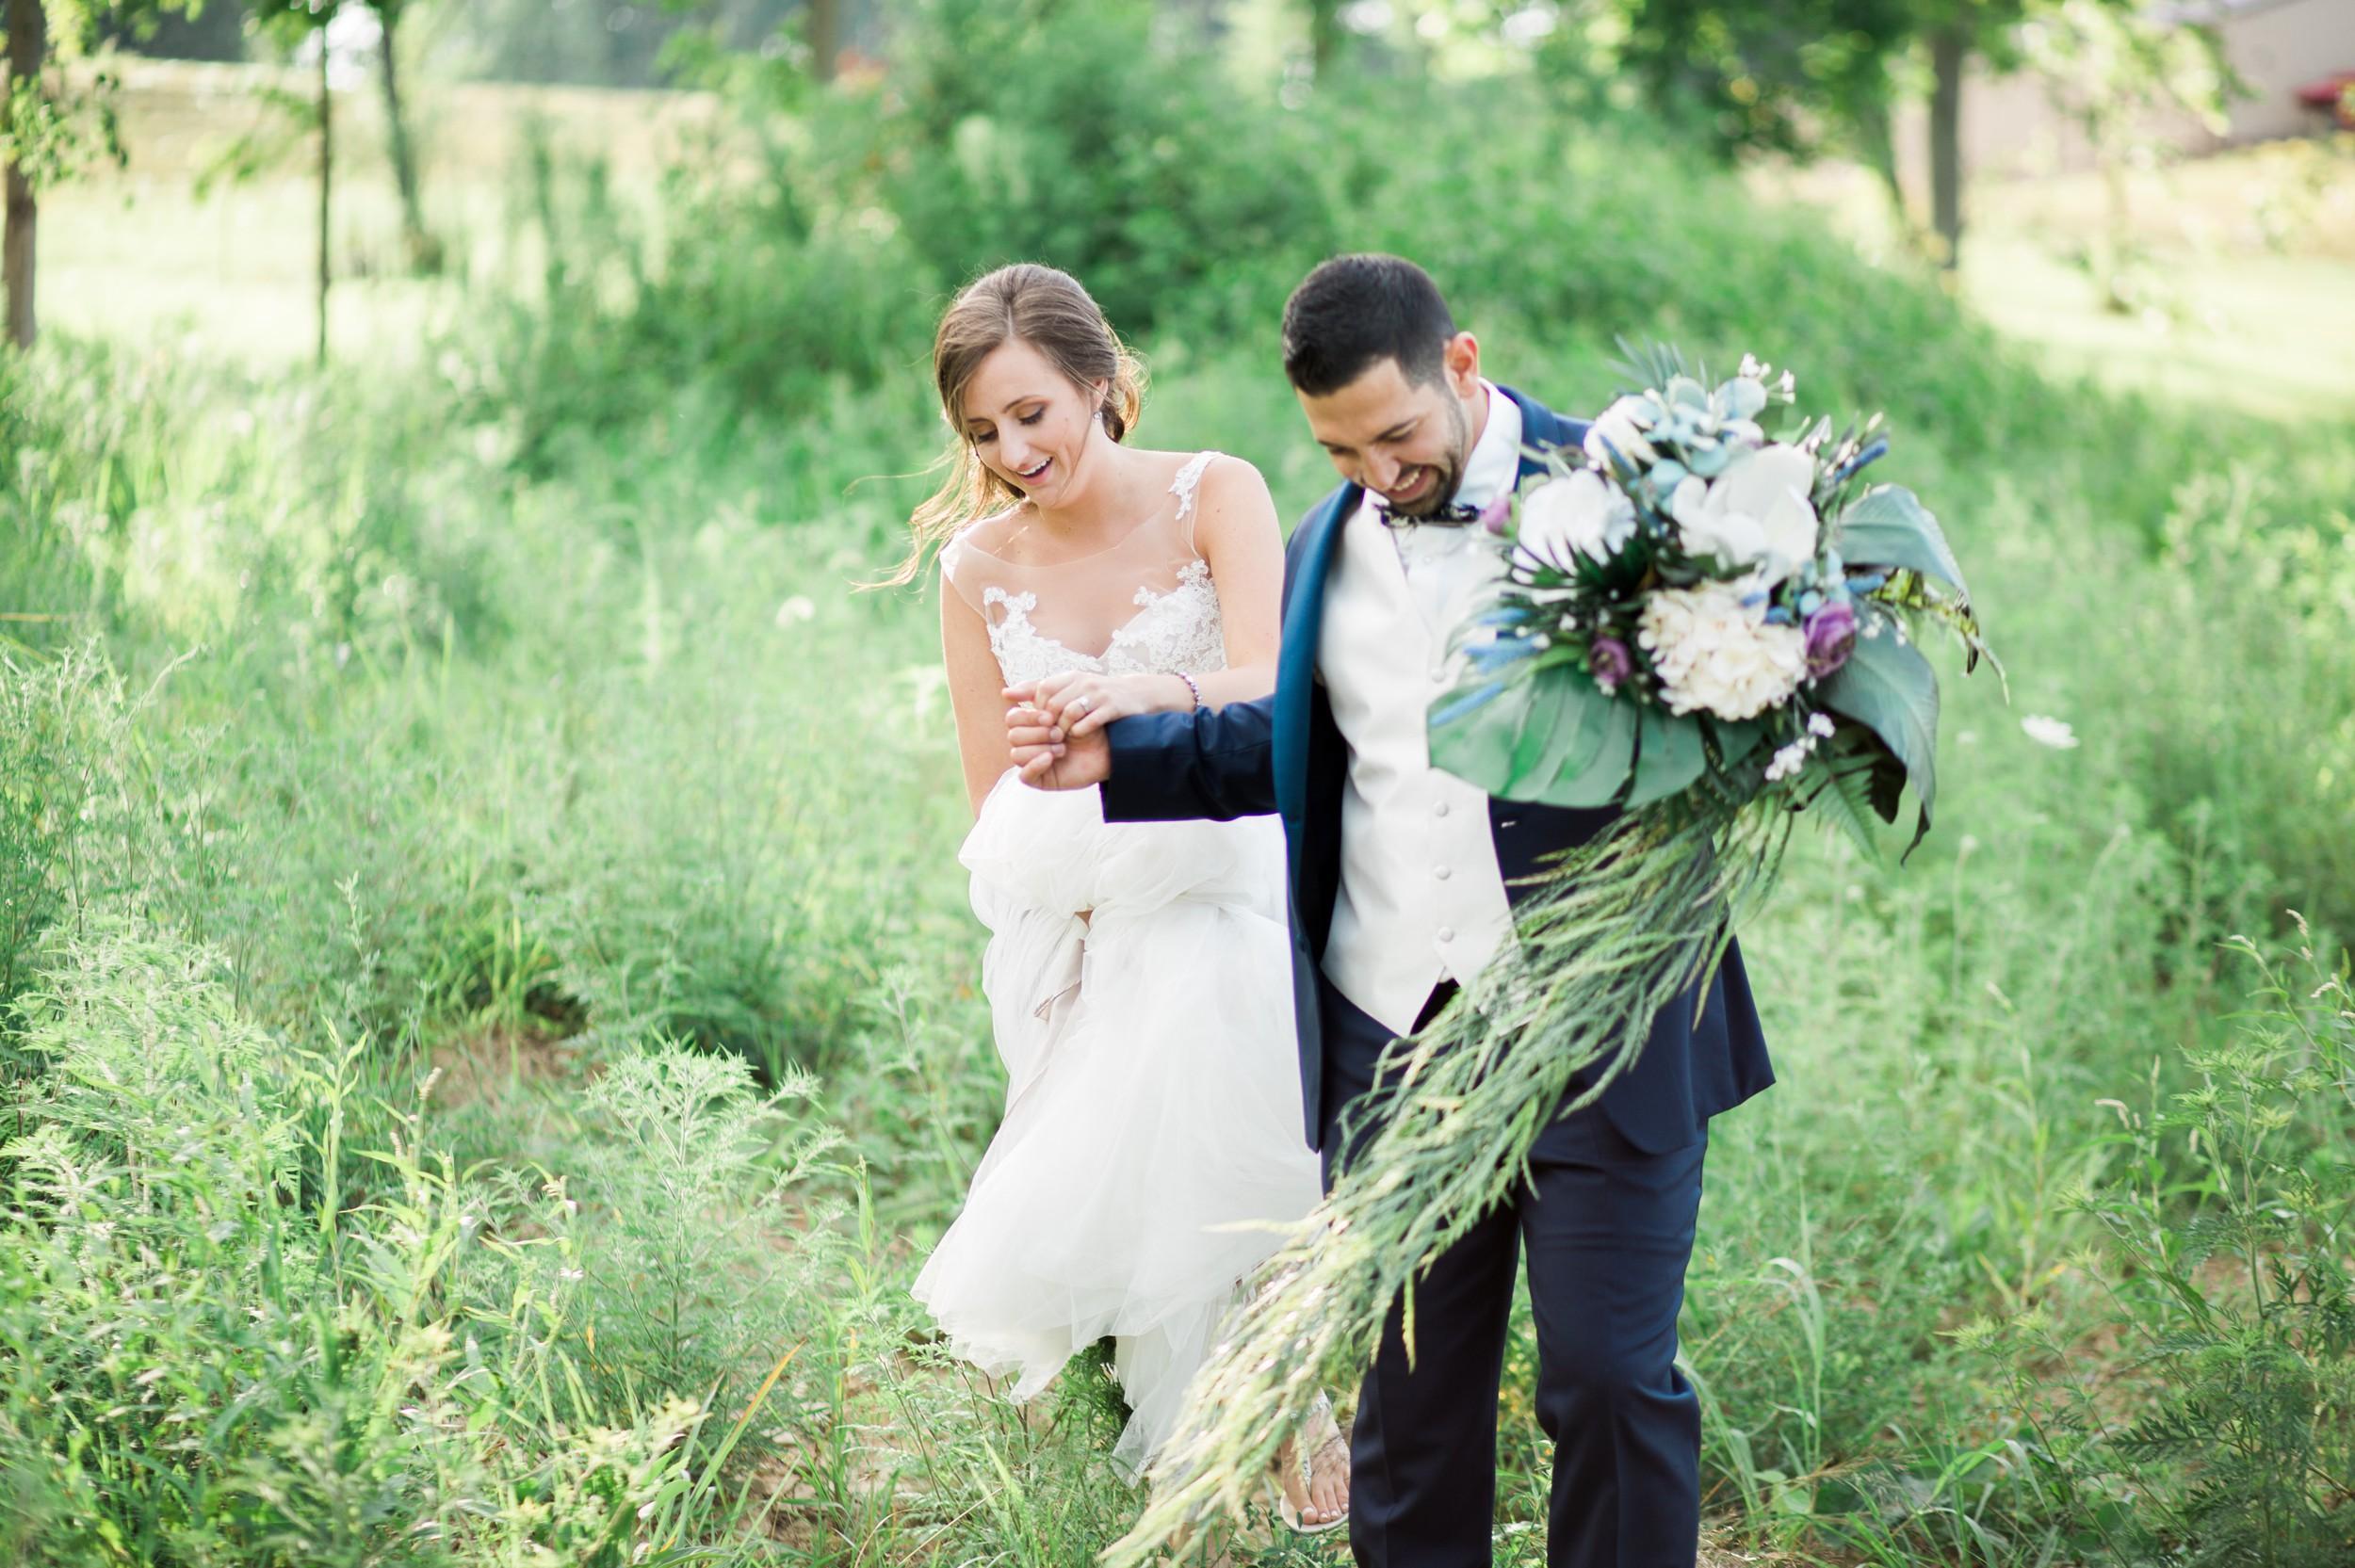 Nick-and-martina-pinelake-vinyards-wedding-columbiana-ohio-tracylynn-photography 26.jpg